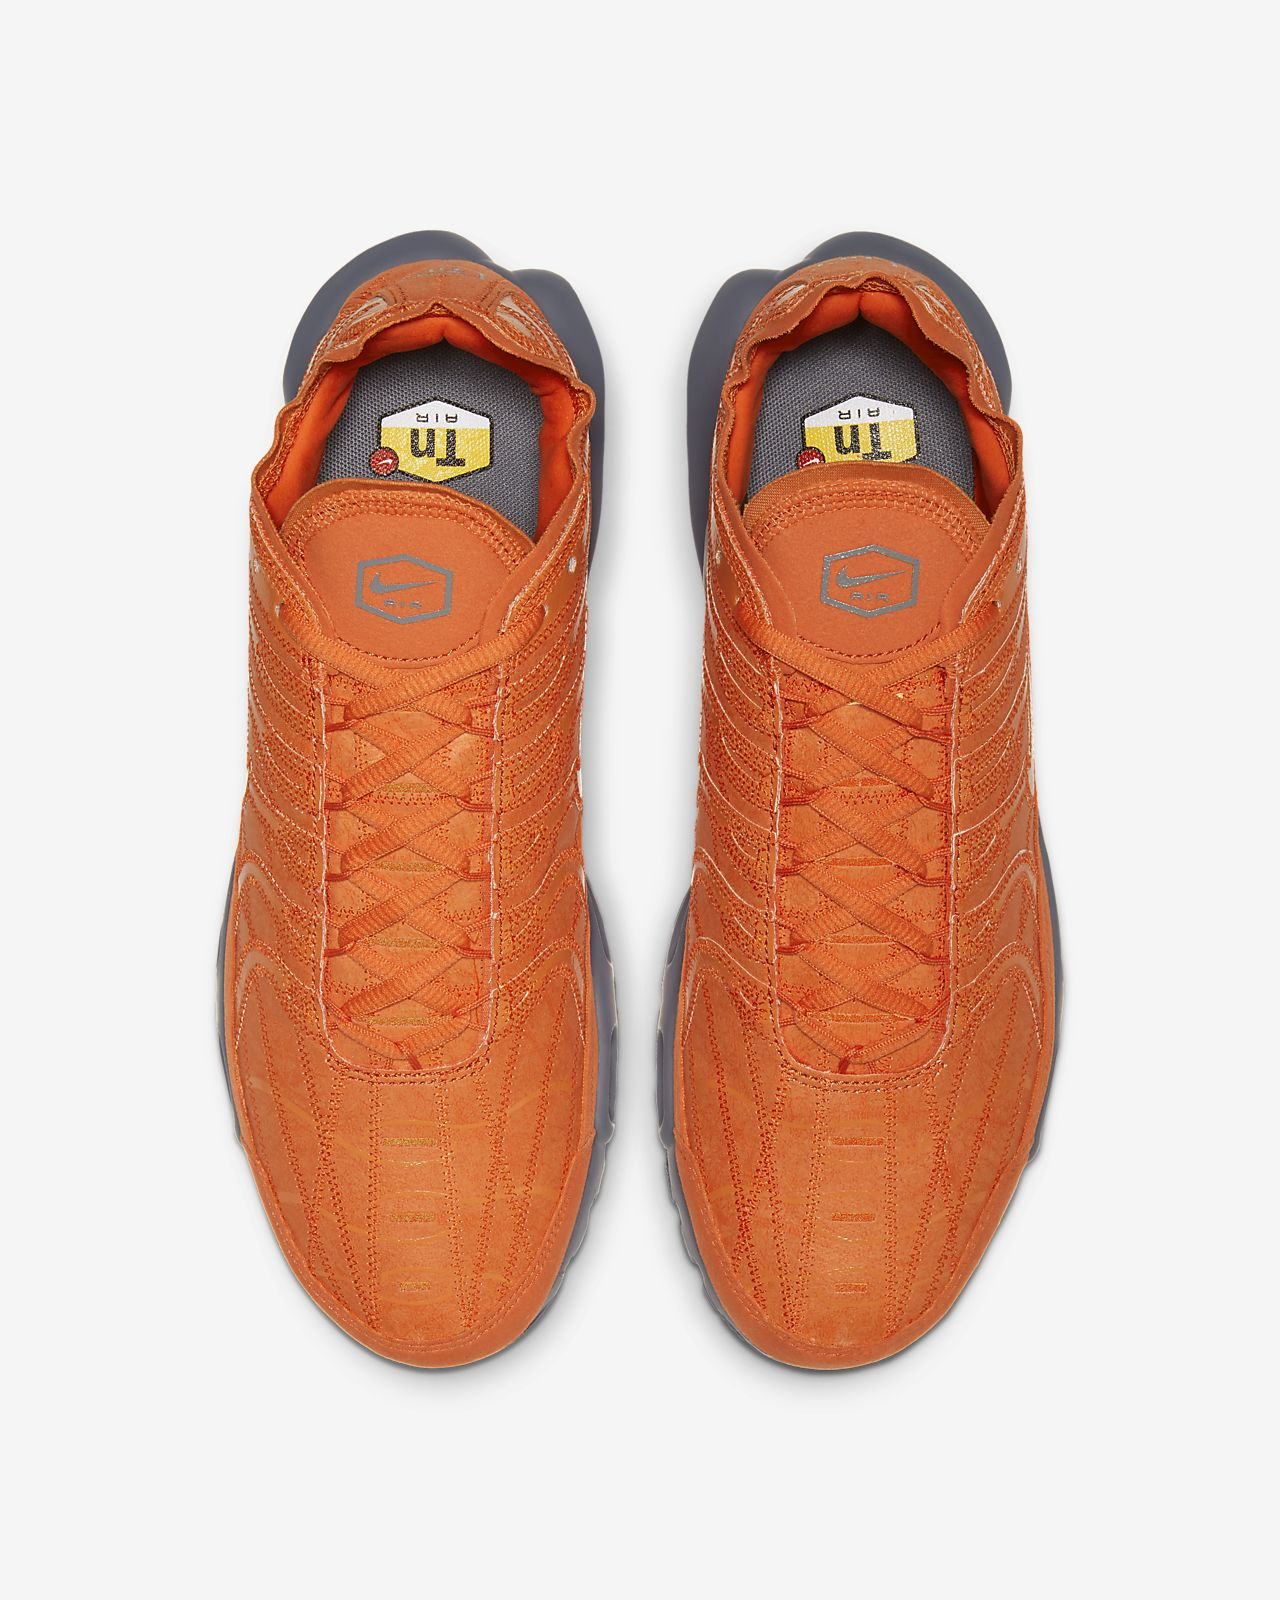 Nike Men's Max Deconstructed Shoe Air Plus BrCQtsxhd